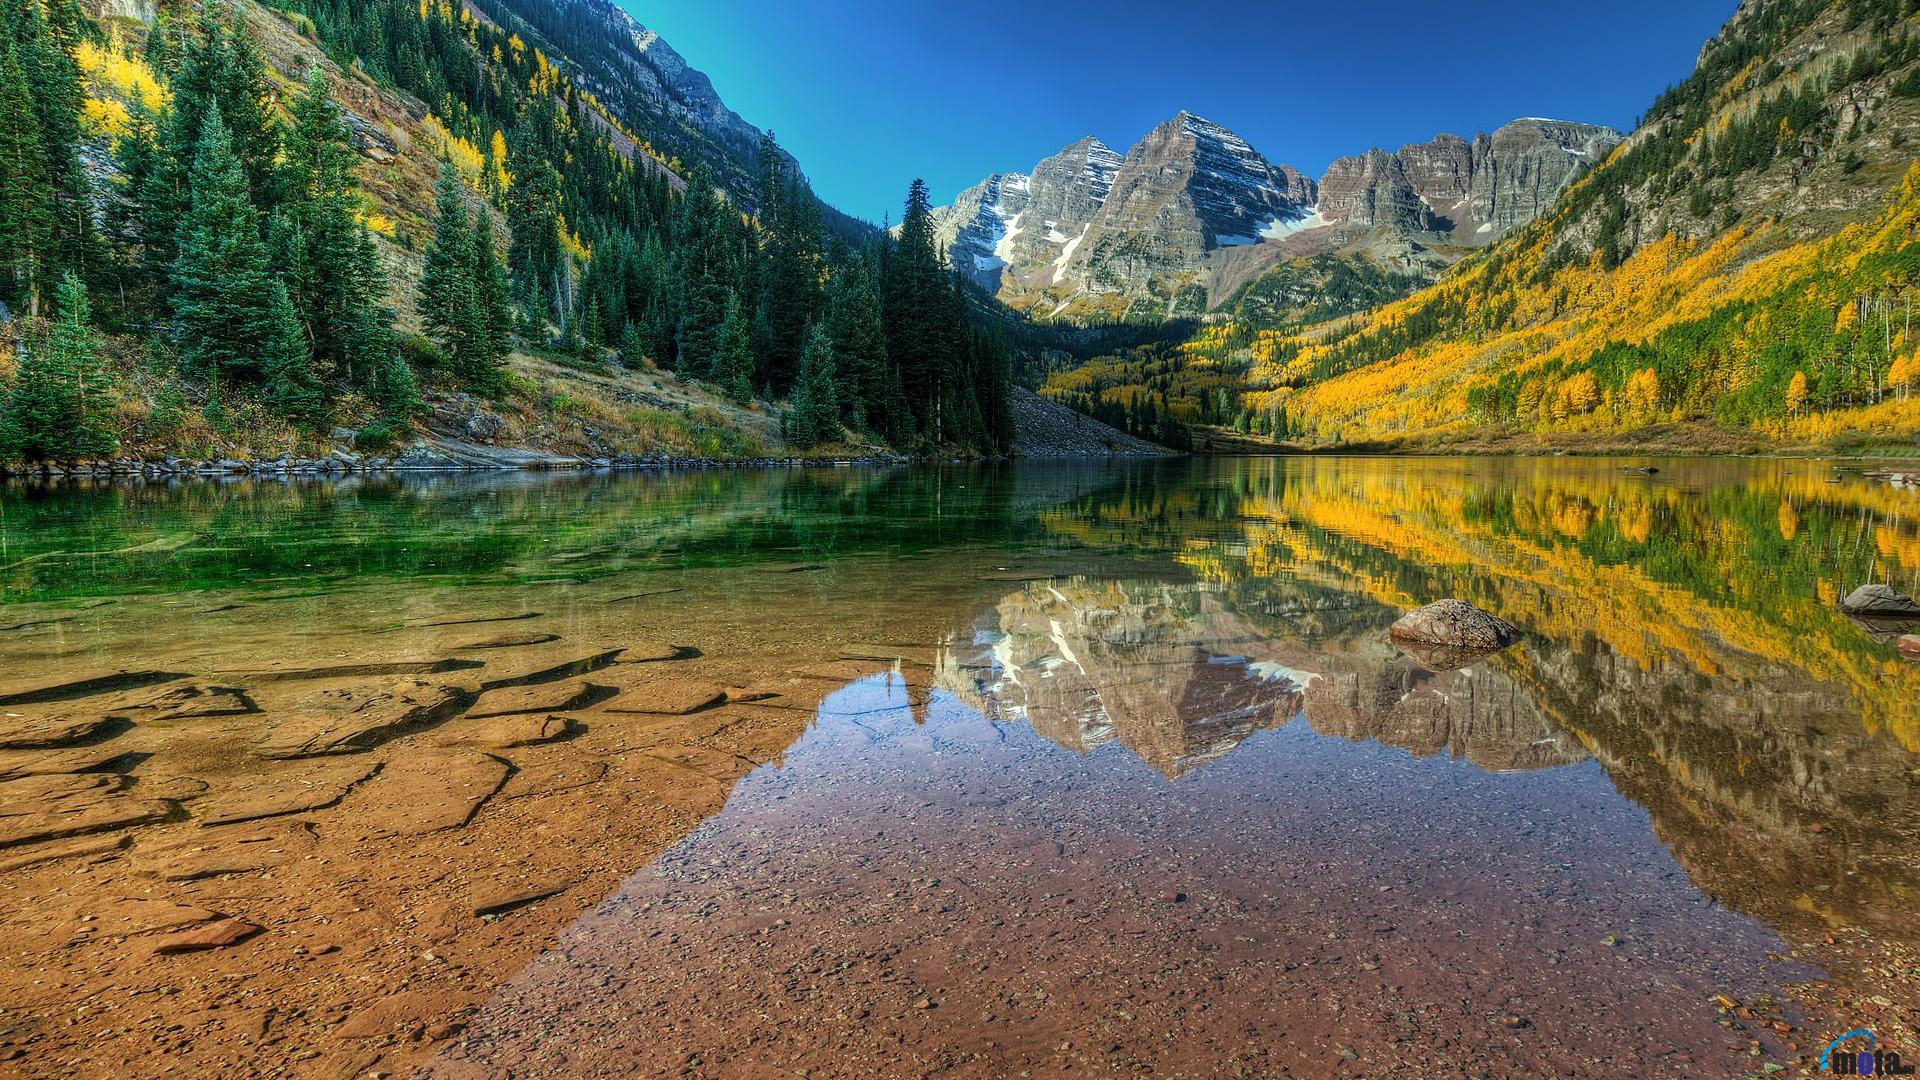 Download Wallpaper Maroon Bells Colorado 1920 x 1080 HDTV 1080p 1920x1080